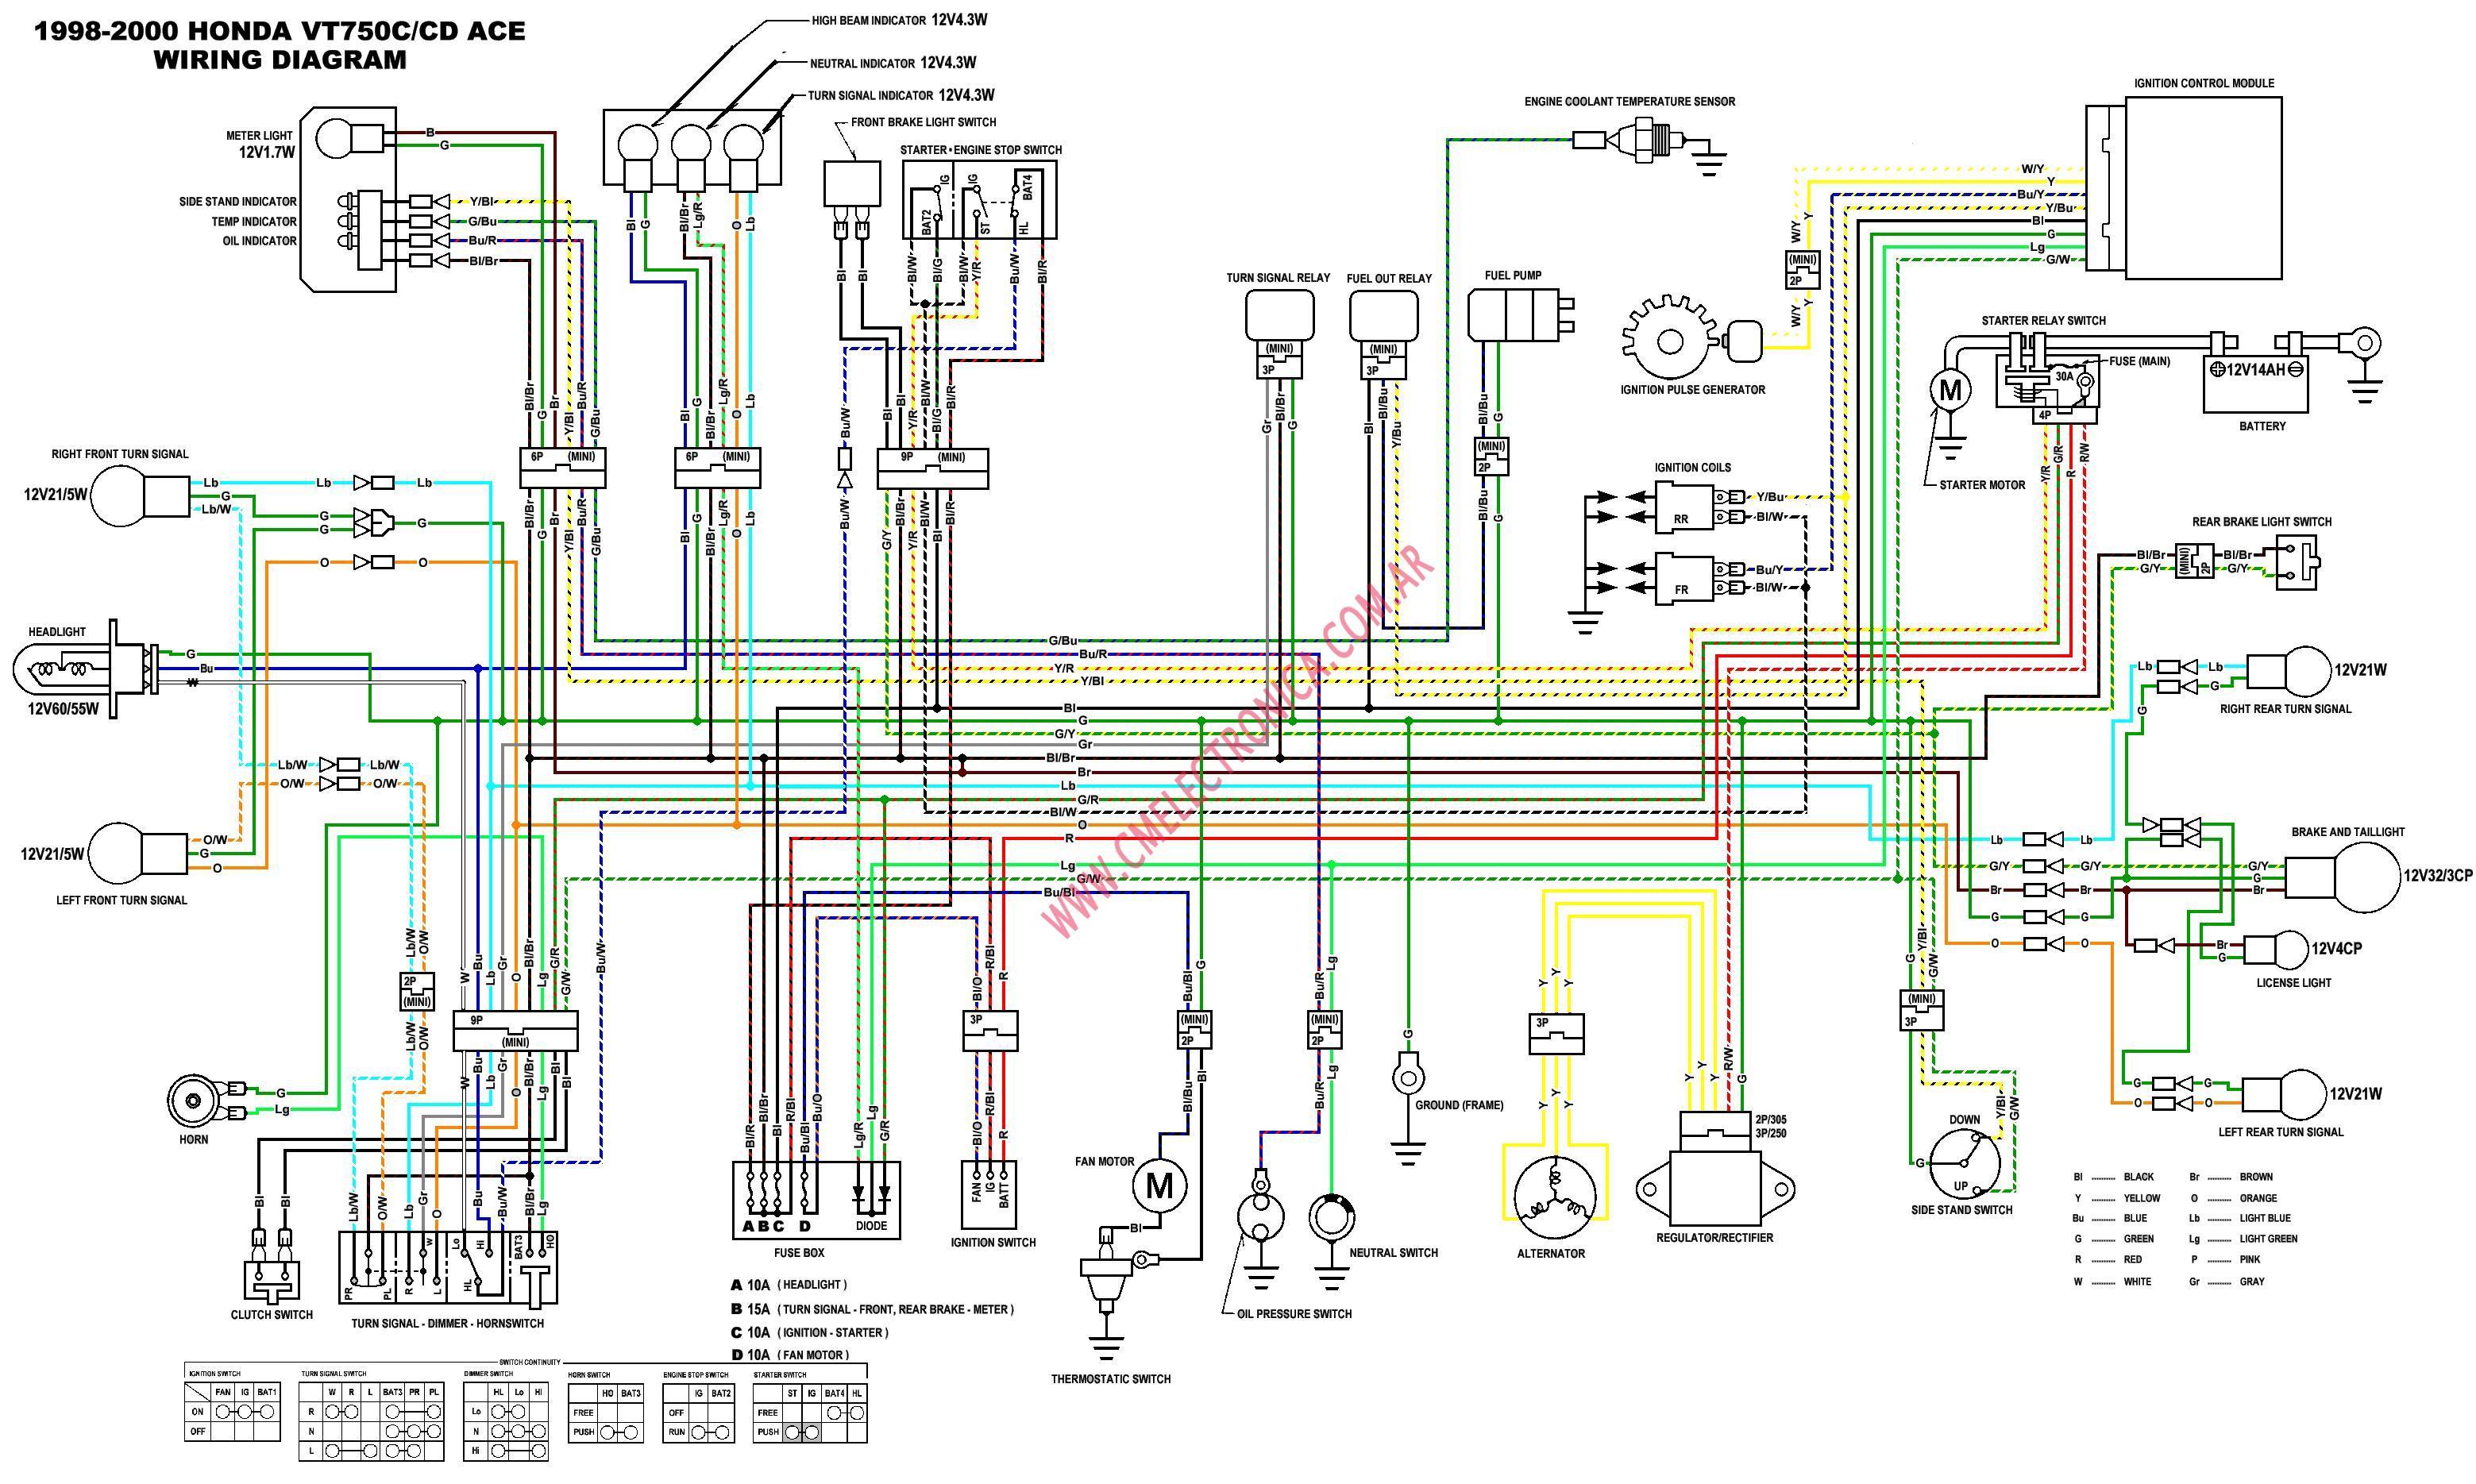 88 honda accord wiring diagram factory diagrams car audio diagrama vt750 00